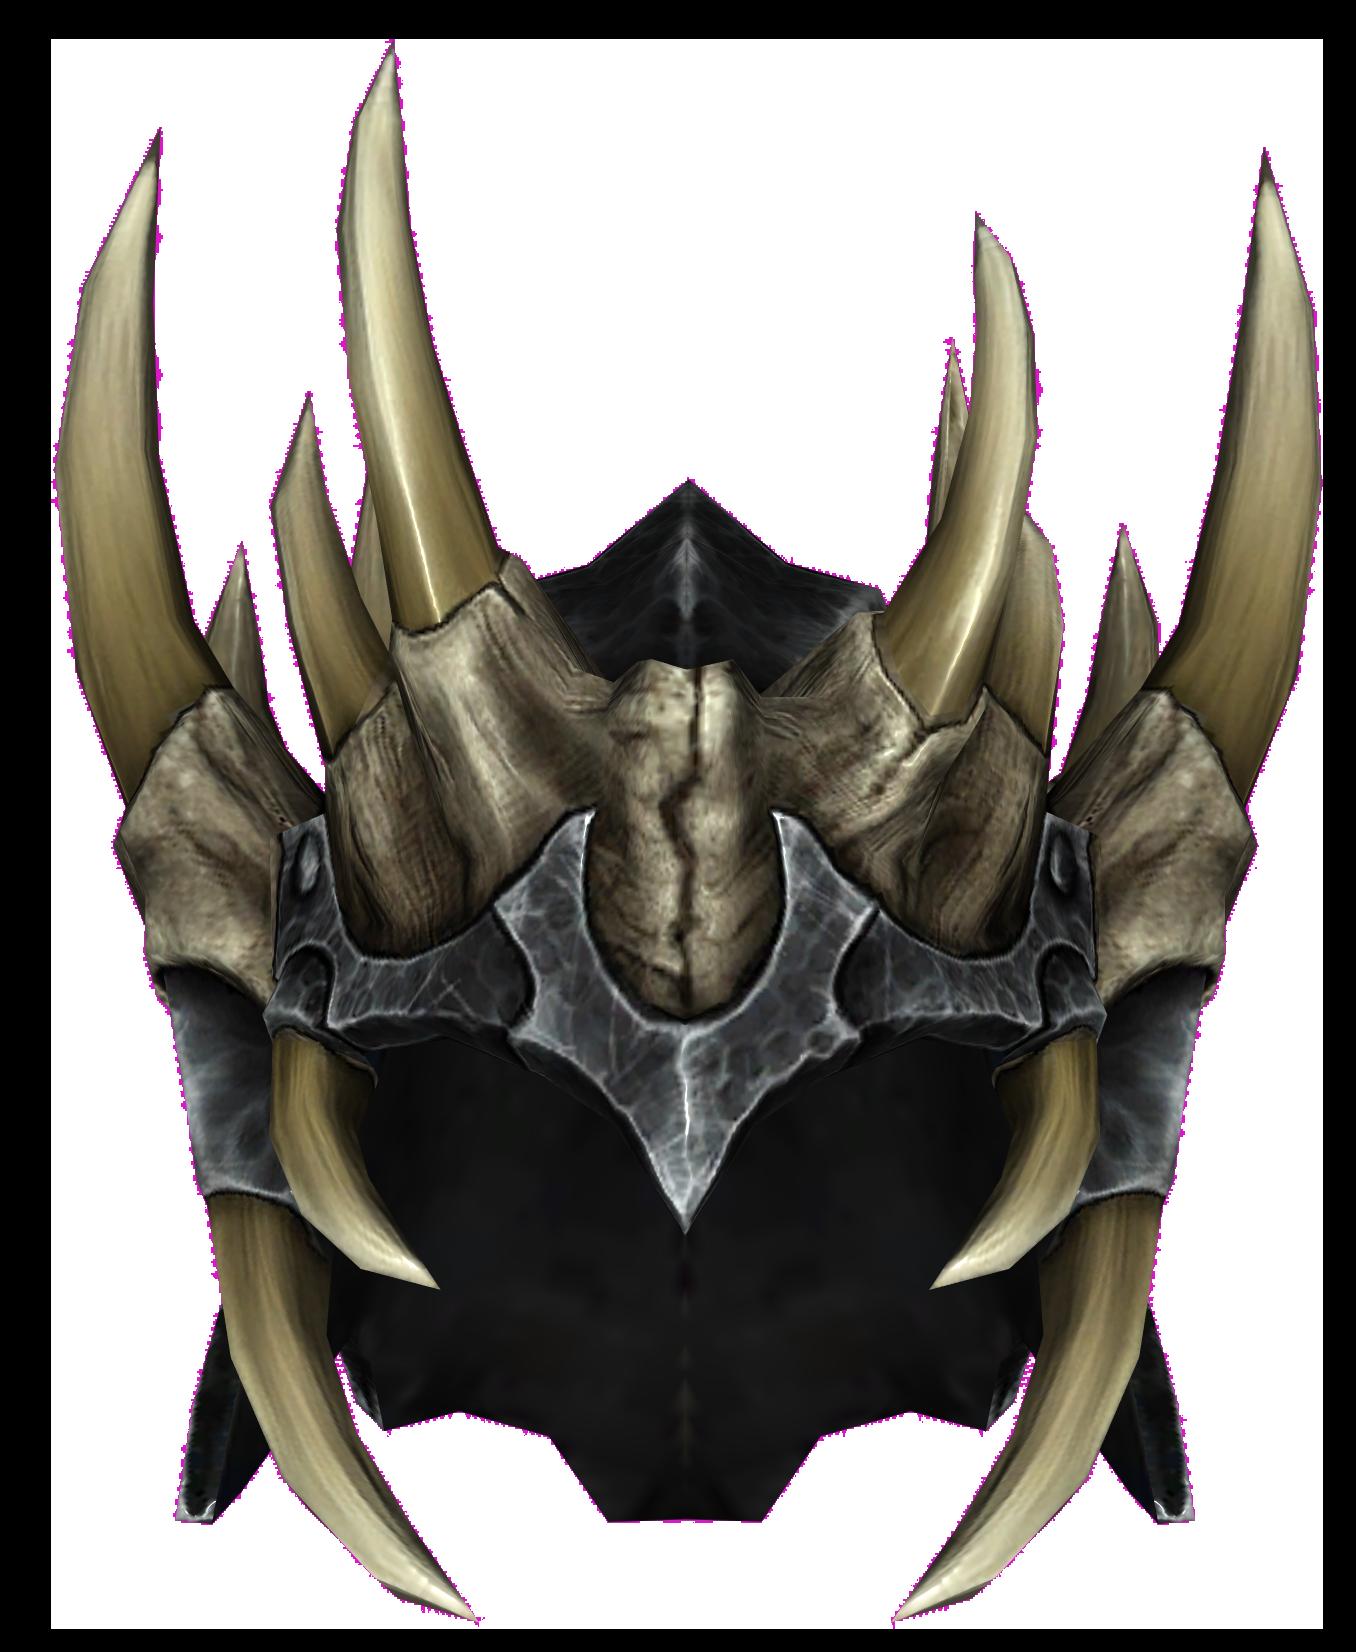 Tamriel Vault - Character Build: Namira's Basilisk